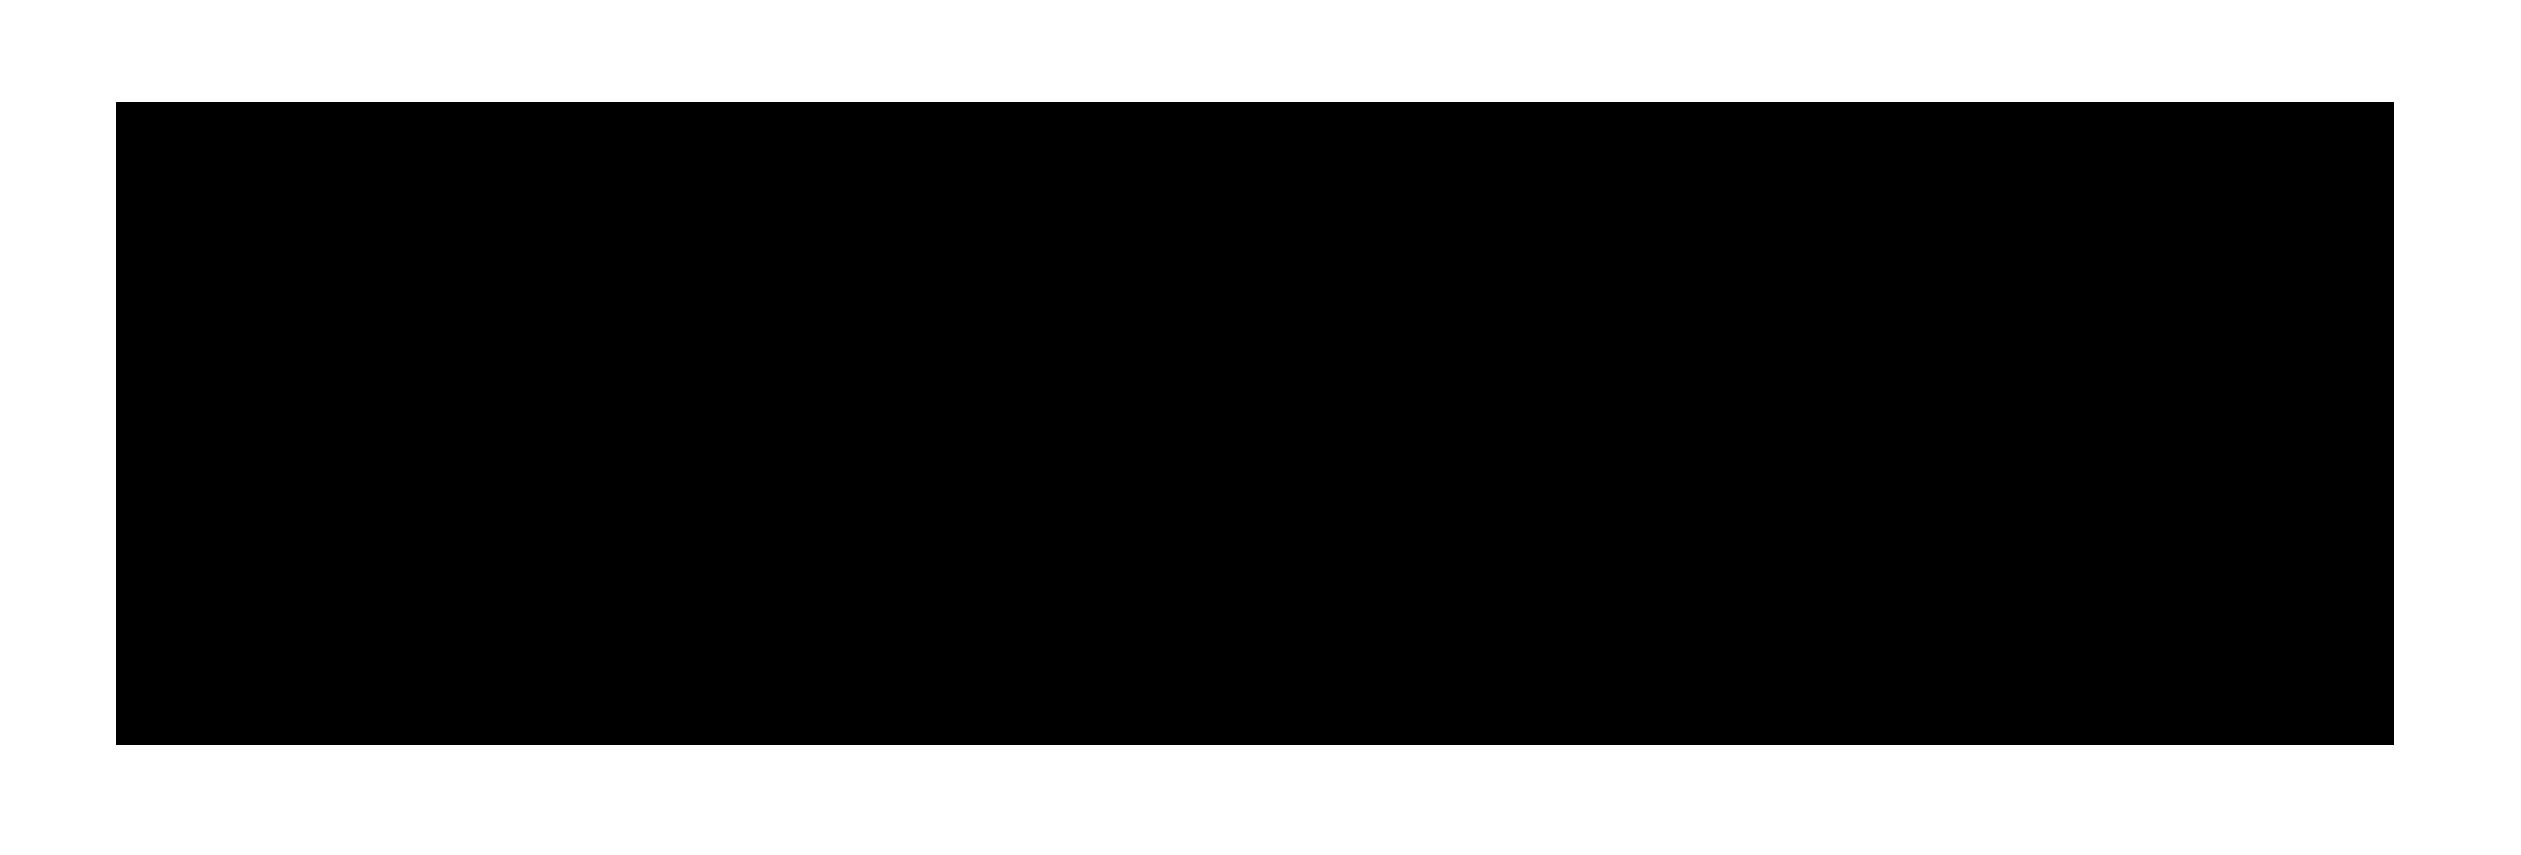 Bazuuca